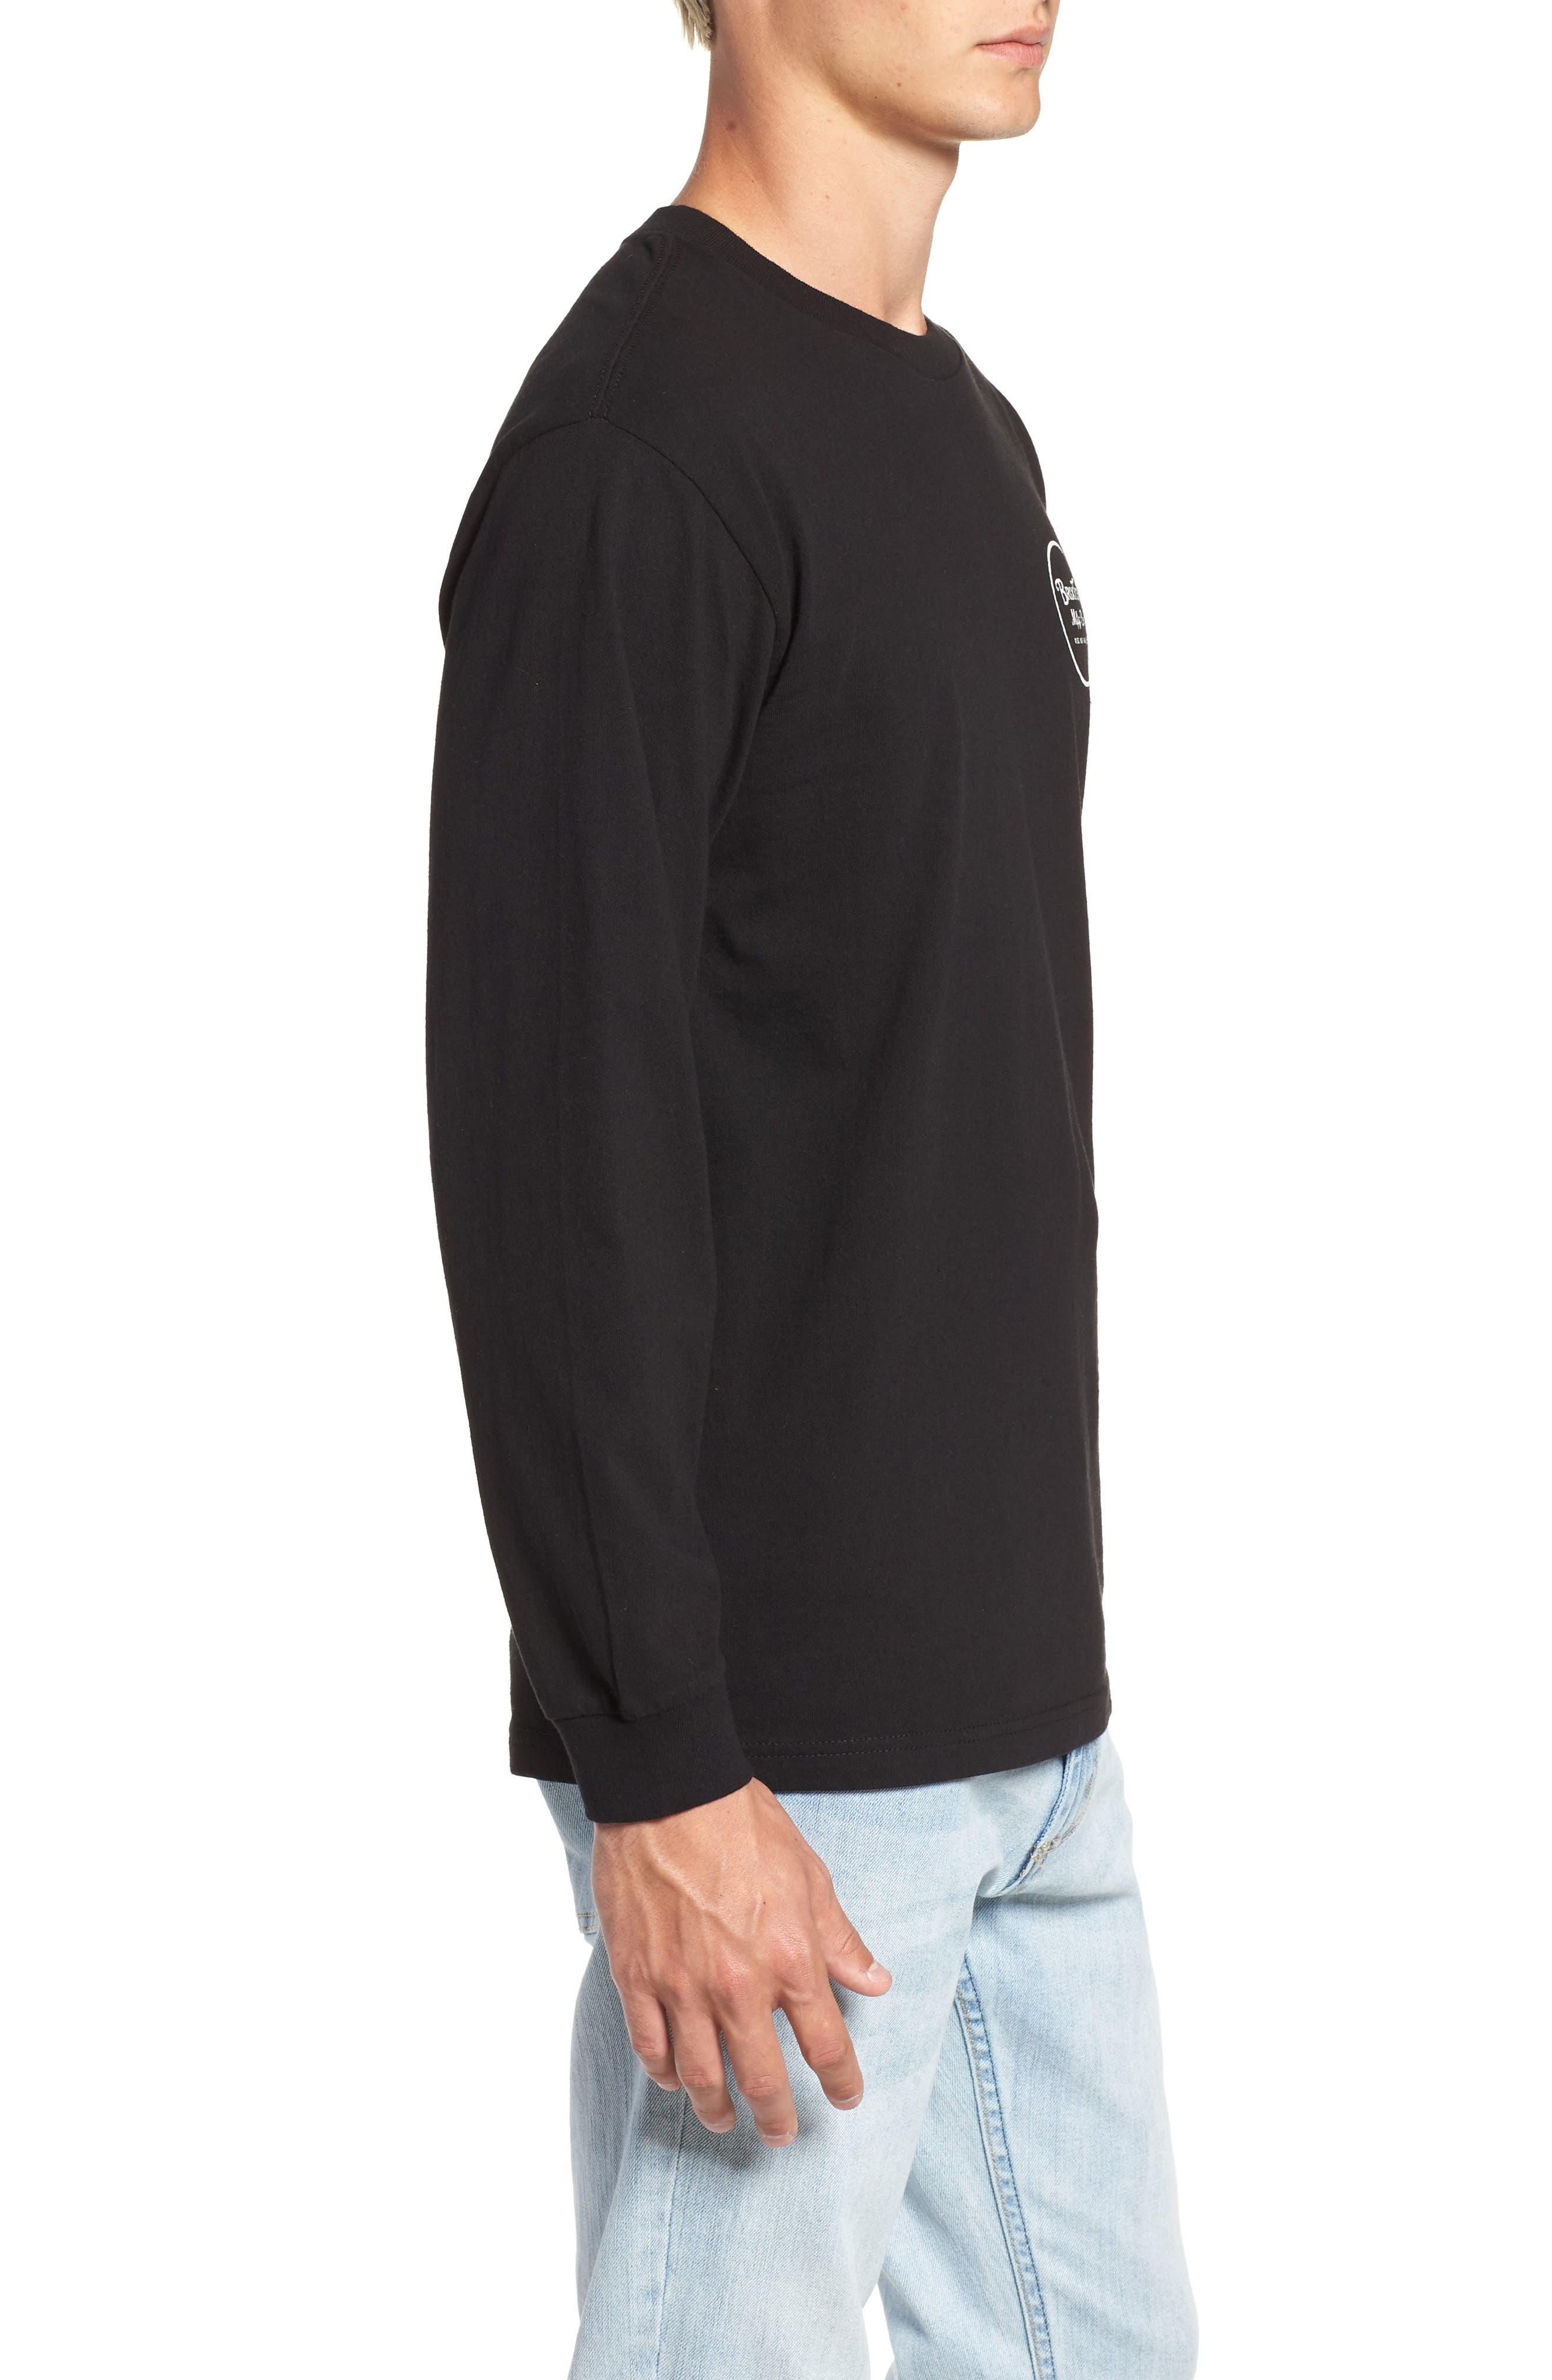 Wheeler II T-Shirt,                             Alternate thumbnail 3, color,                             BLACK